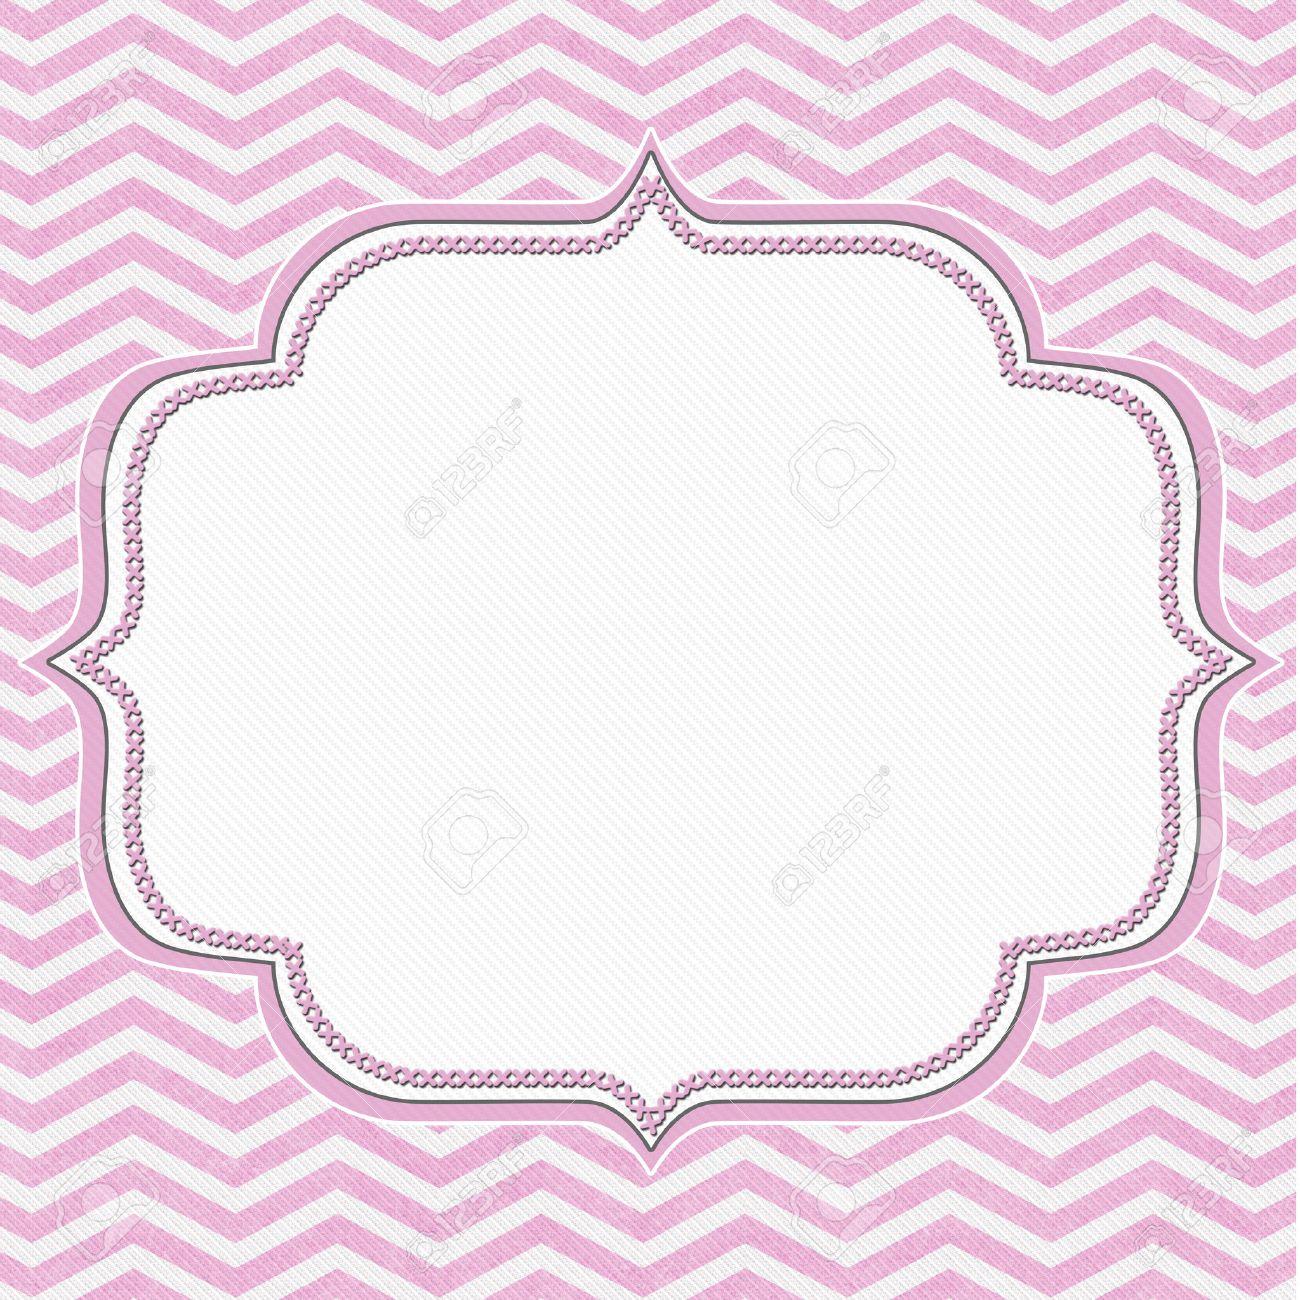 Вышивка розовый фон